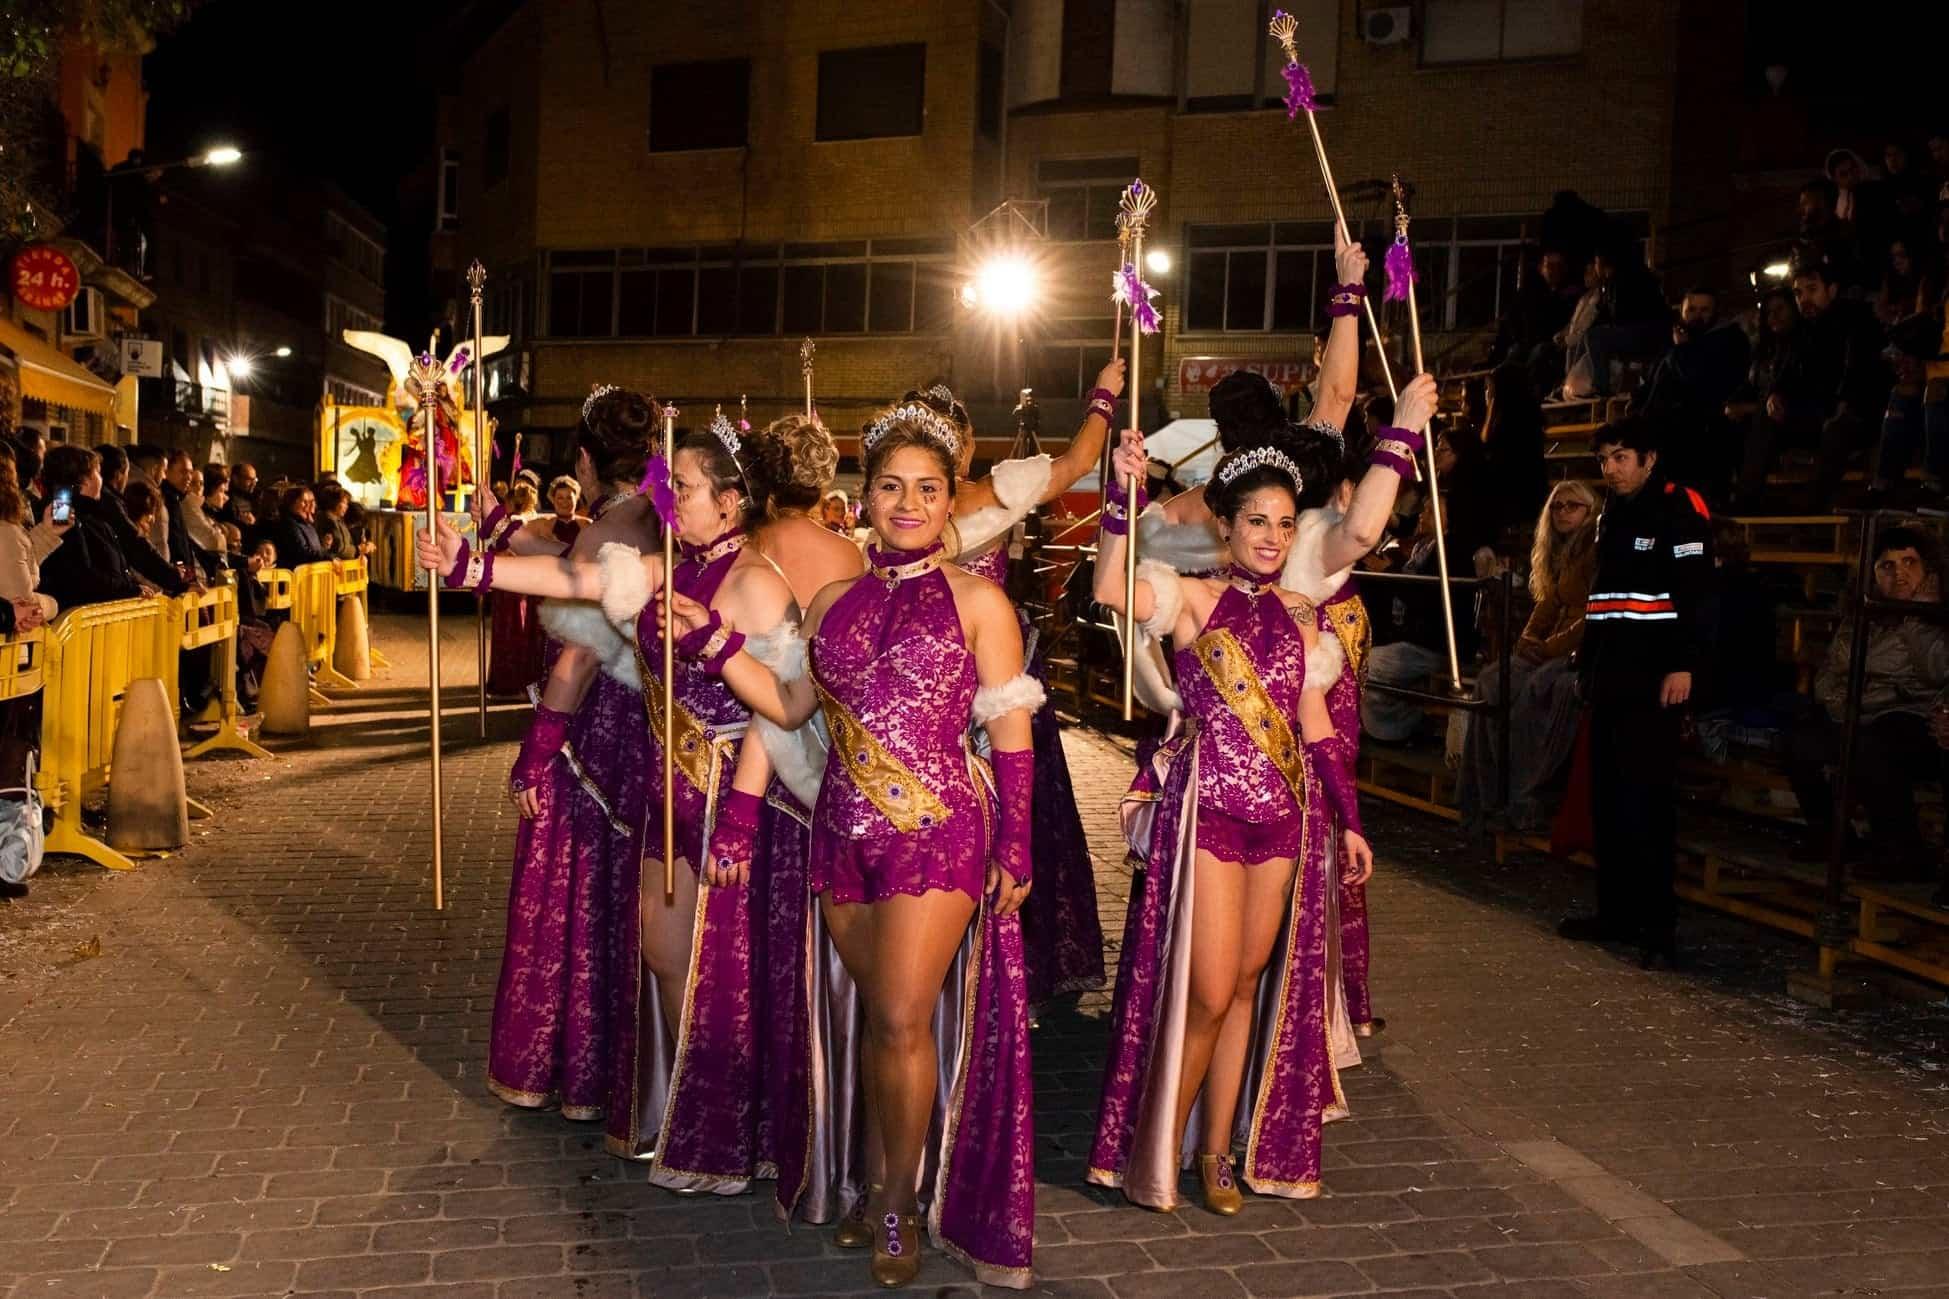 Carnaval de herencia 2020 ofertorio 1 - Selección de fotografías del Ofertorio del Carnaval de Herencia